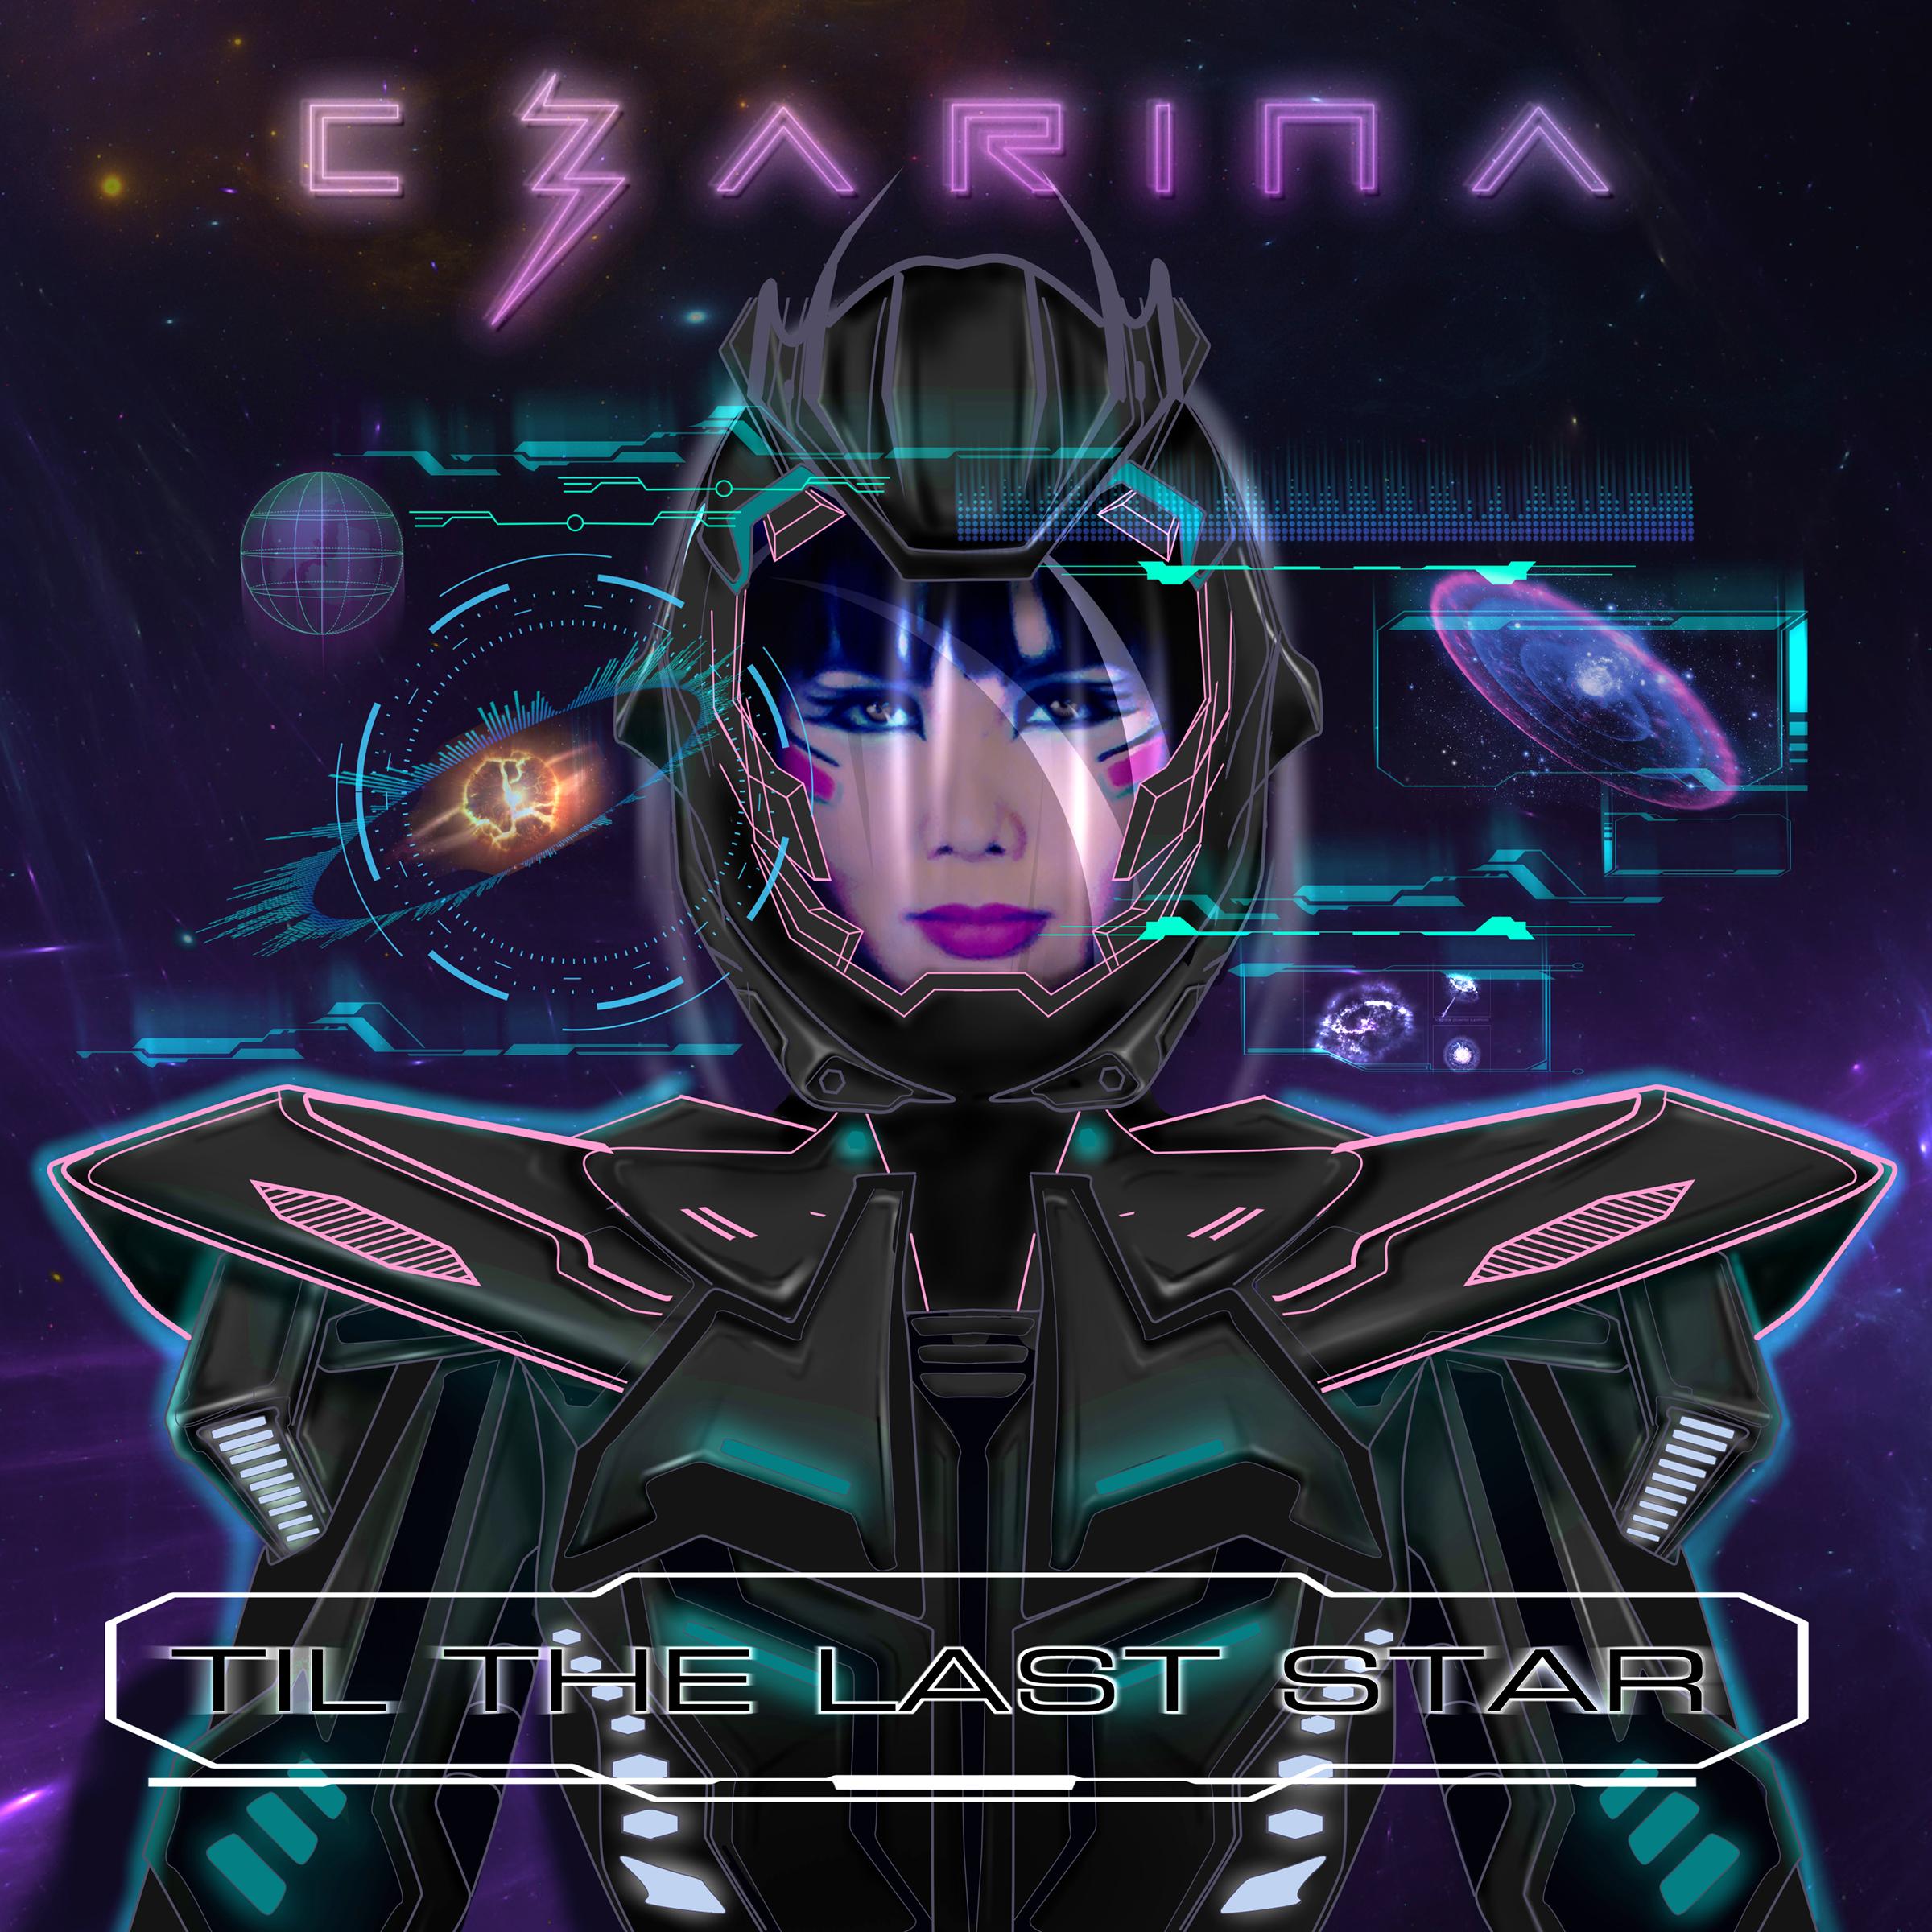 CZARINA-TilTheLastStar-sml.jpg